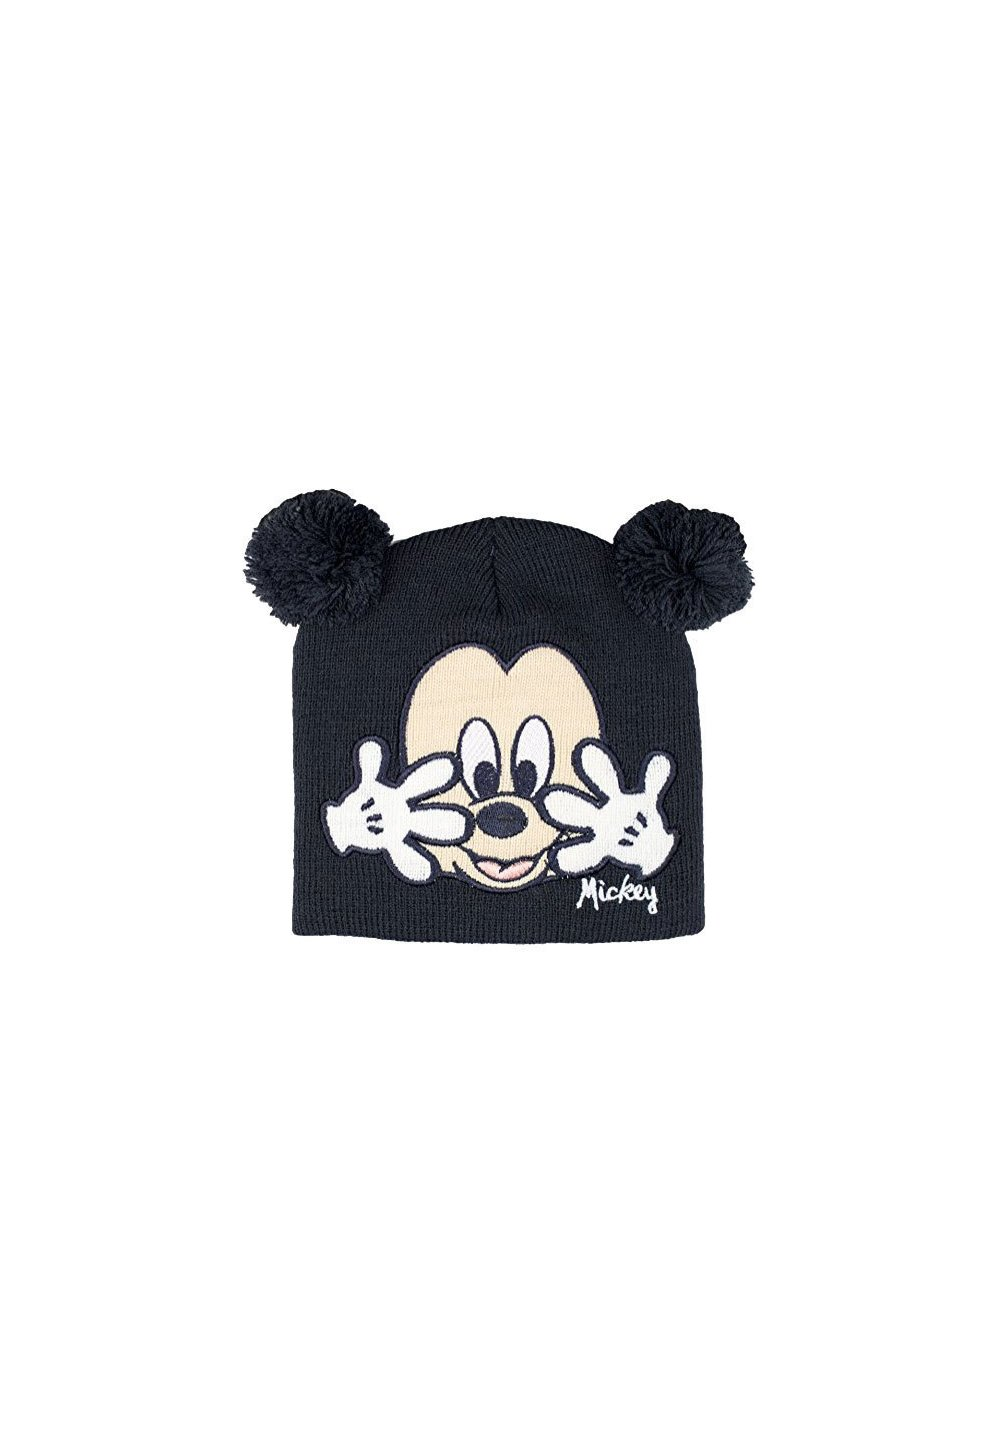 Caciula bebe, gri, Mickey Mouse imagine